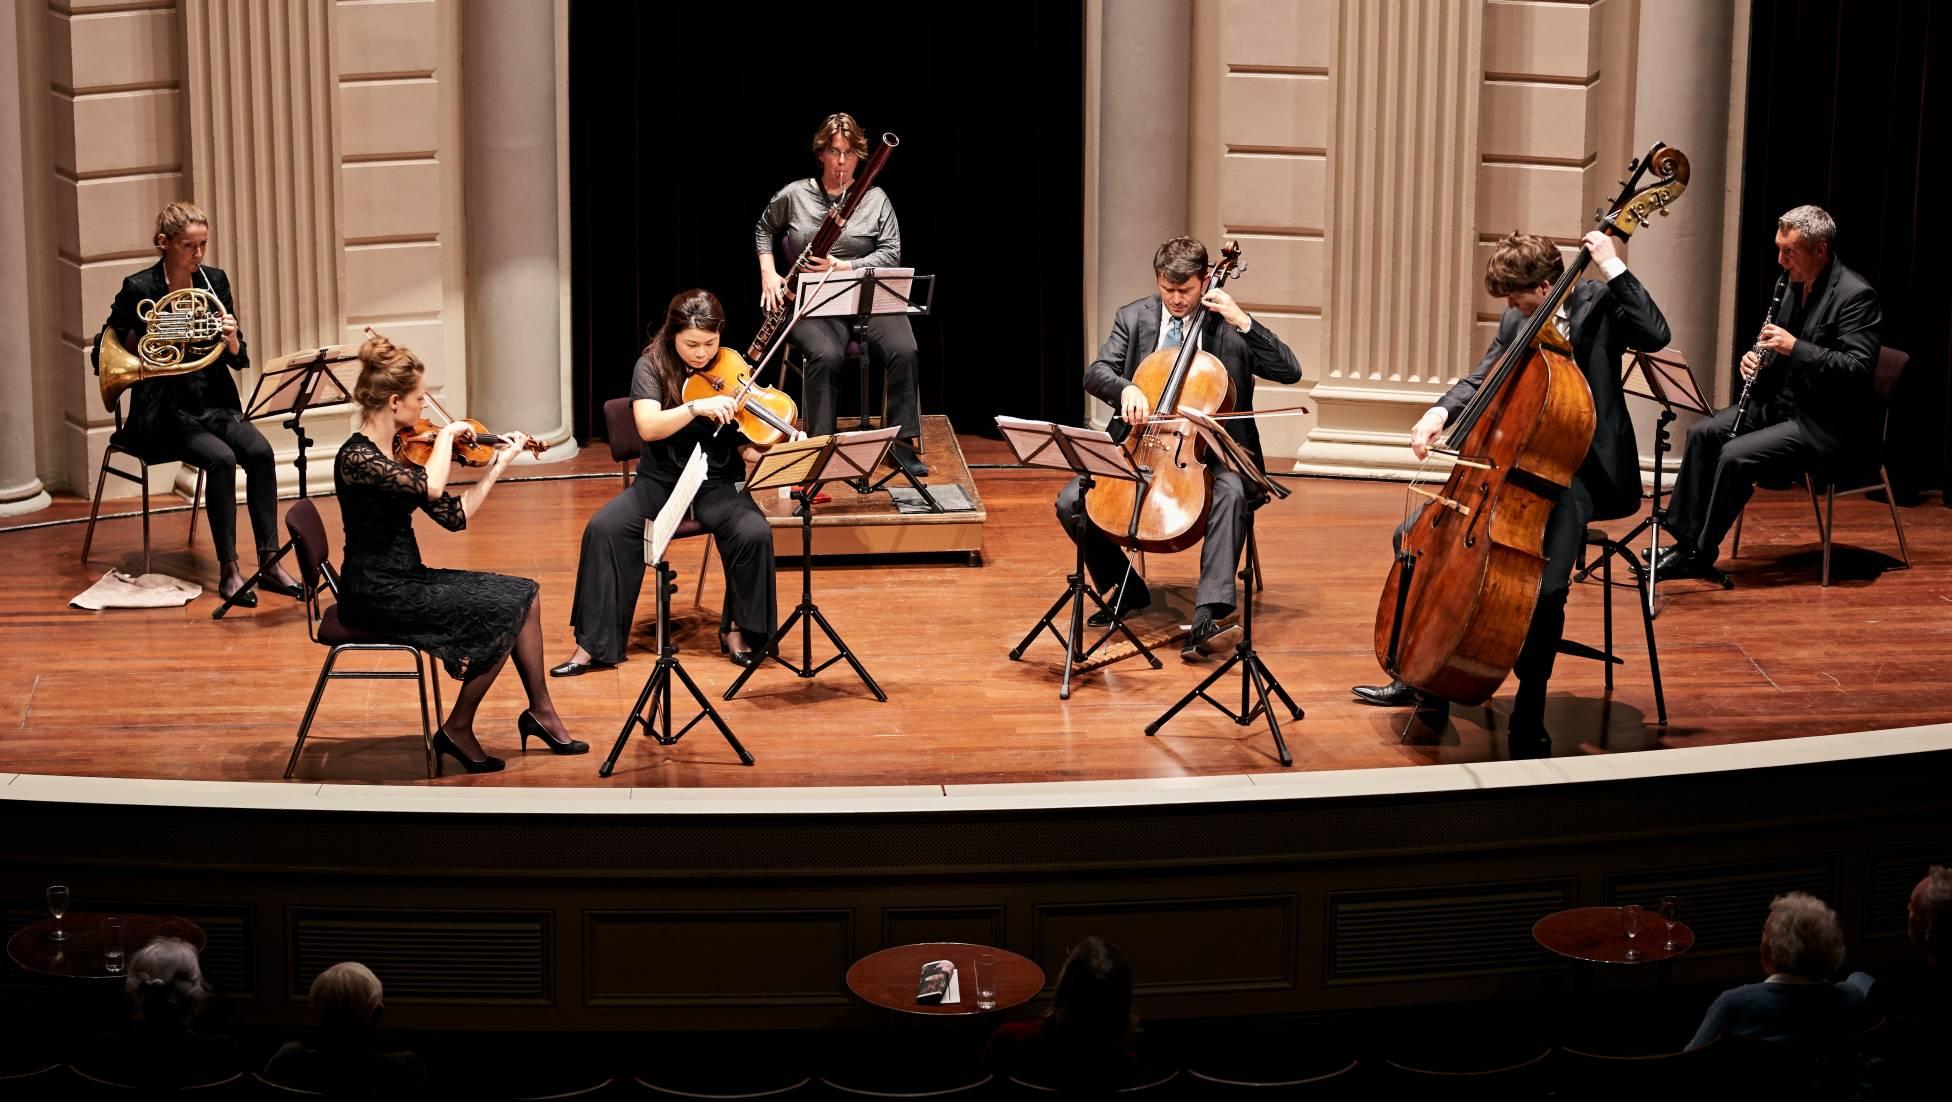 Close-up concerten in concertseizoen 2021/2022